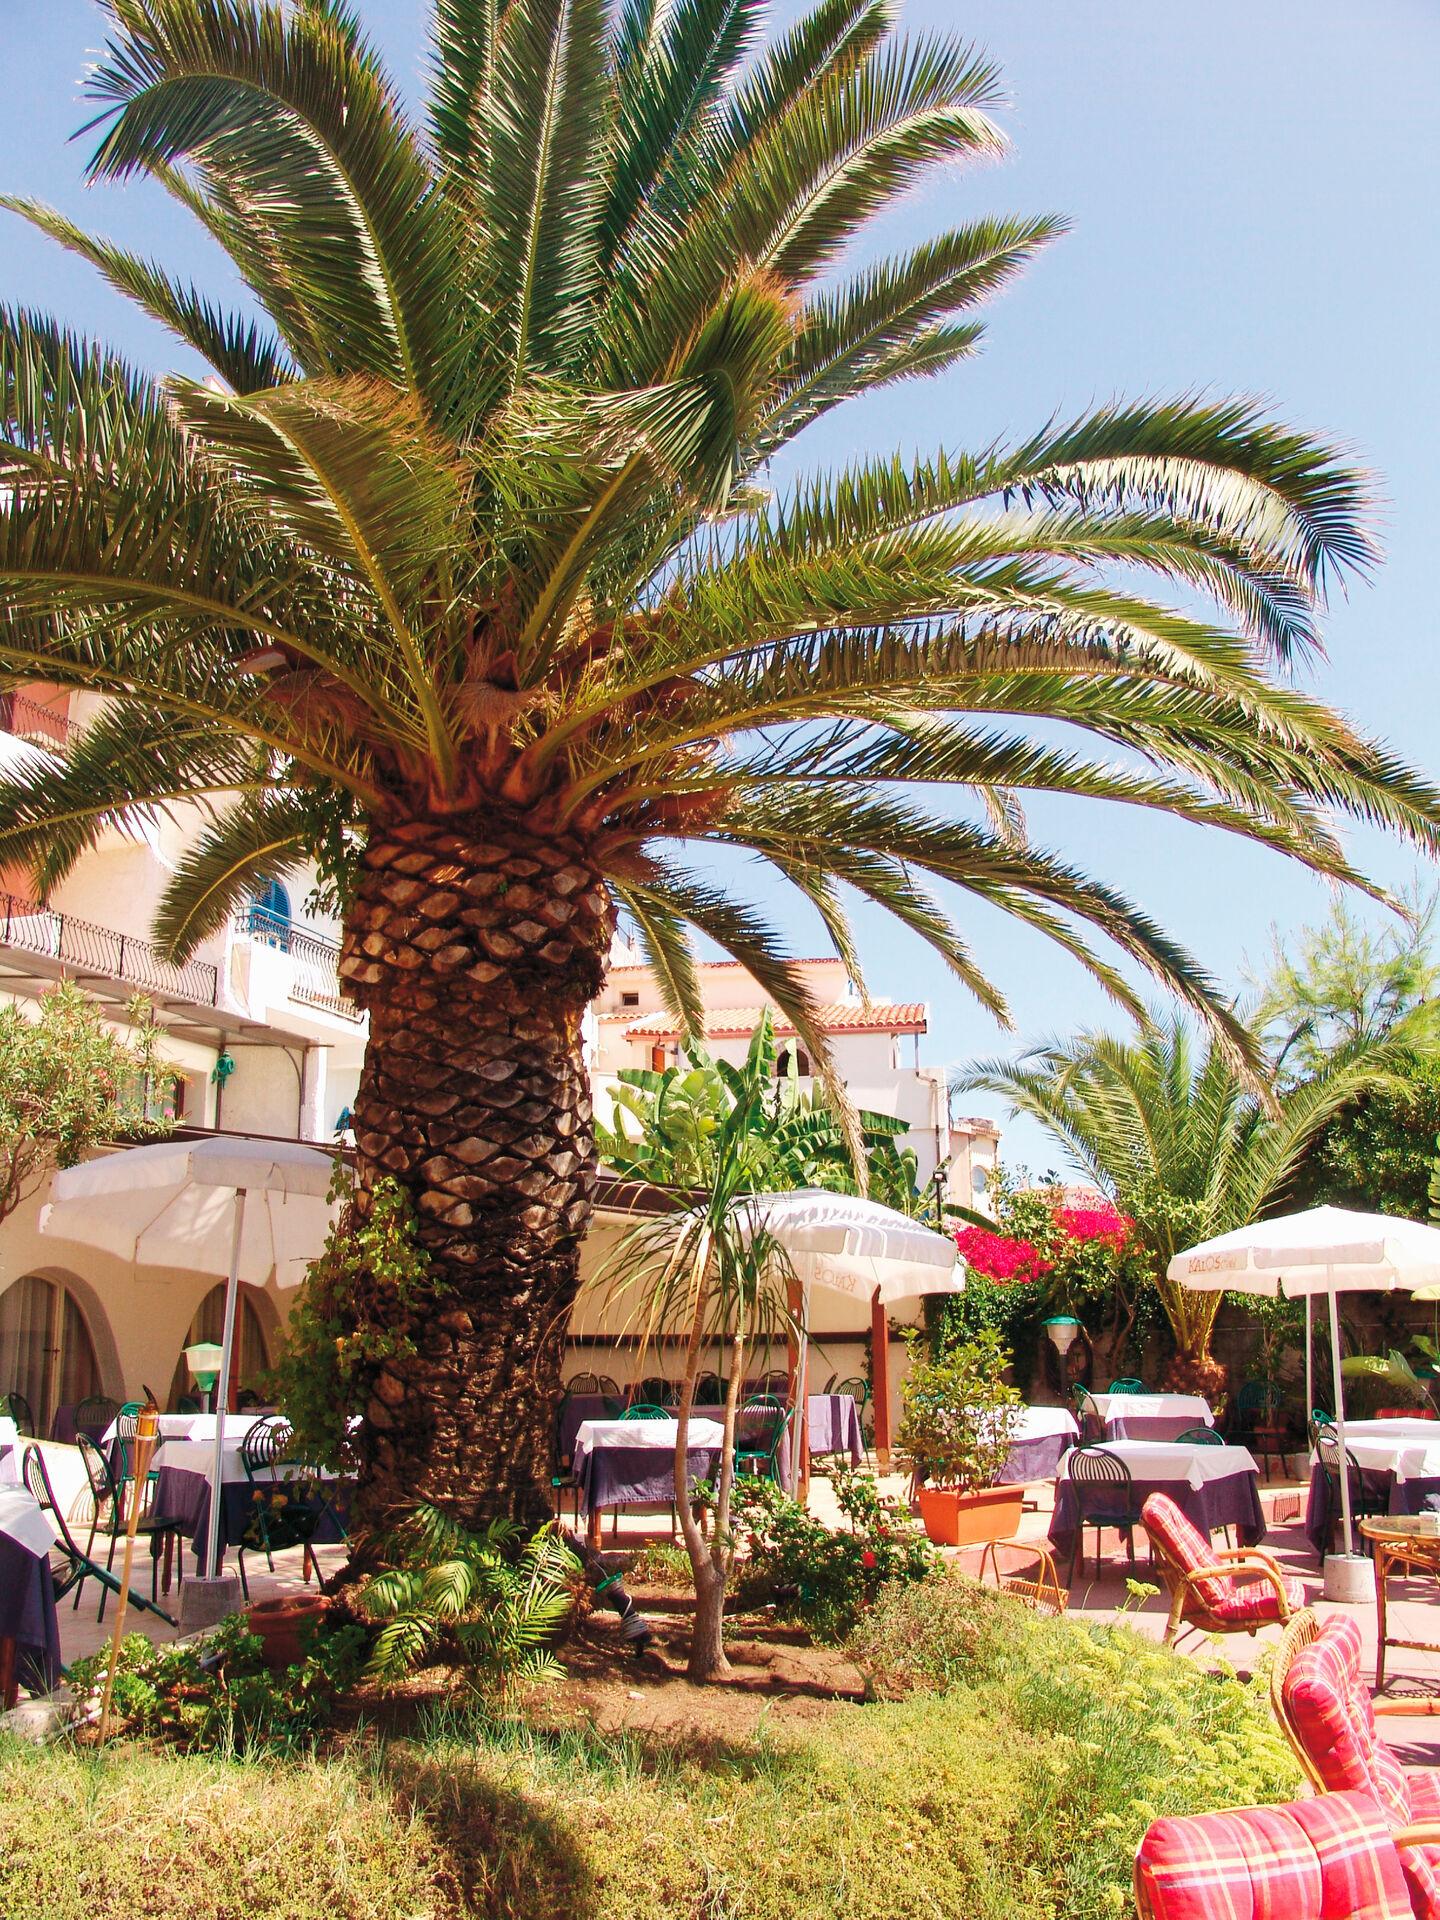 Italie - Sicile - Hôtel Kalos 3*